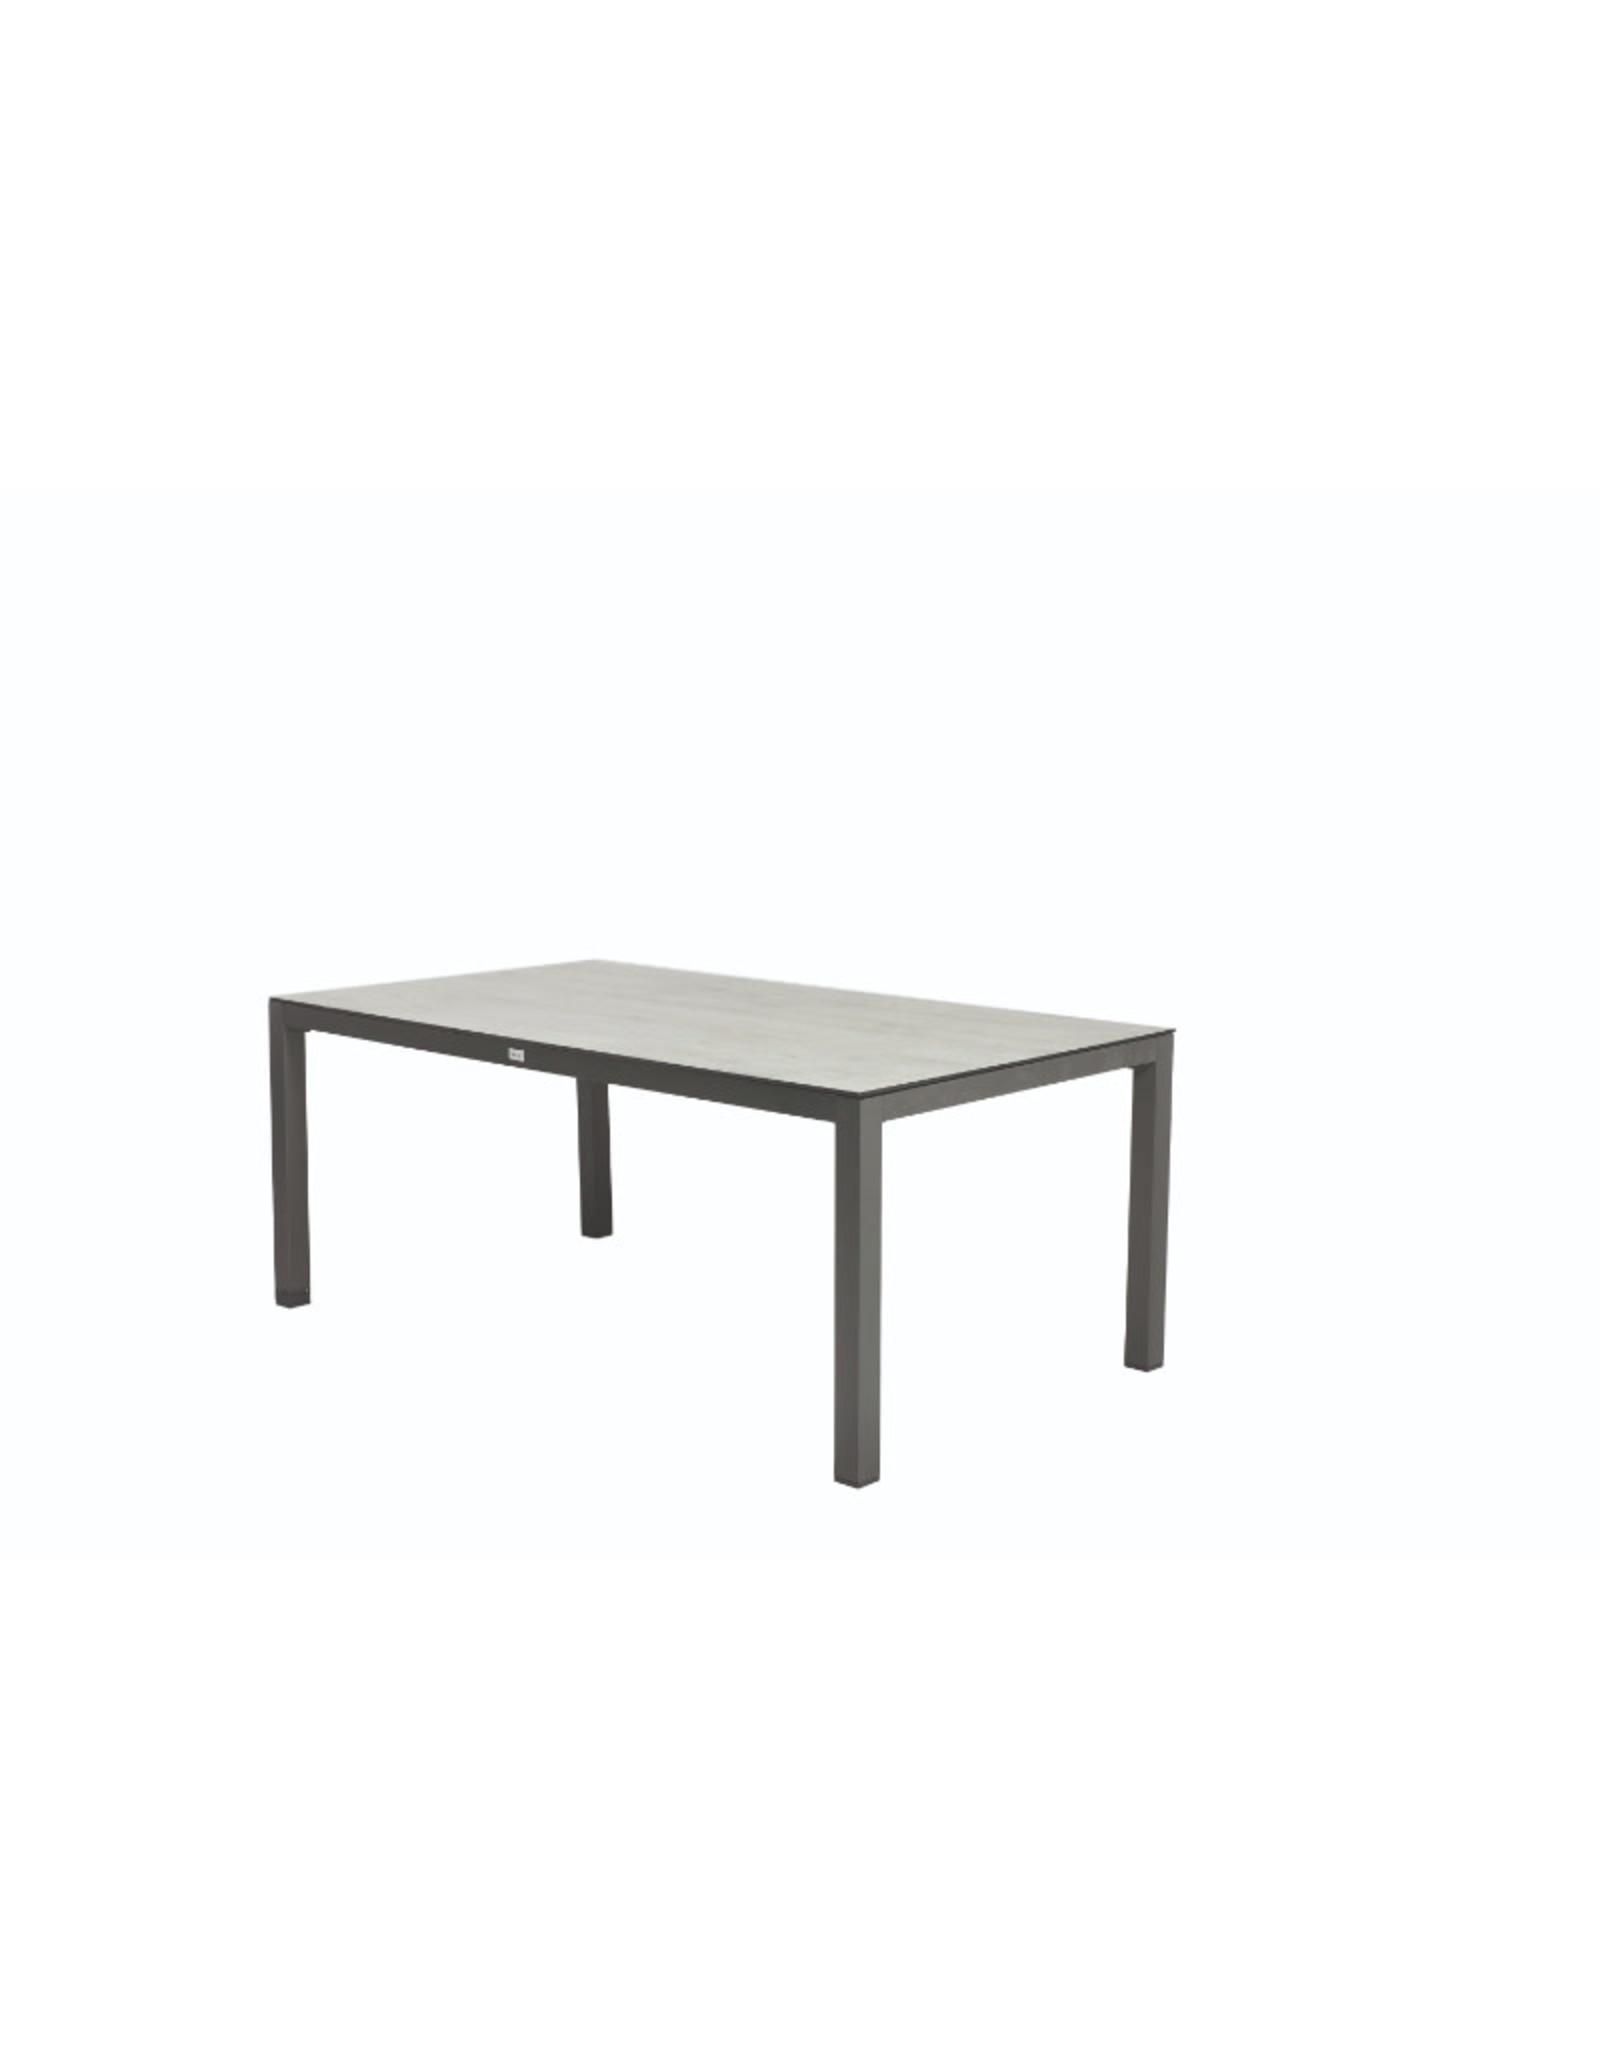 Tierra Outdoor Tierra Outdoor Briga Table Trespa Oak Grey 180x100cm Charcoal Frame